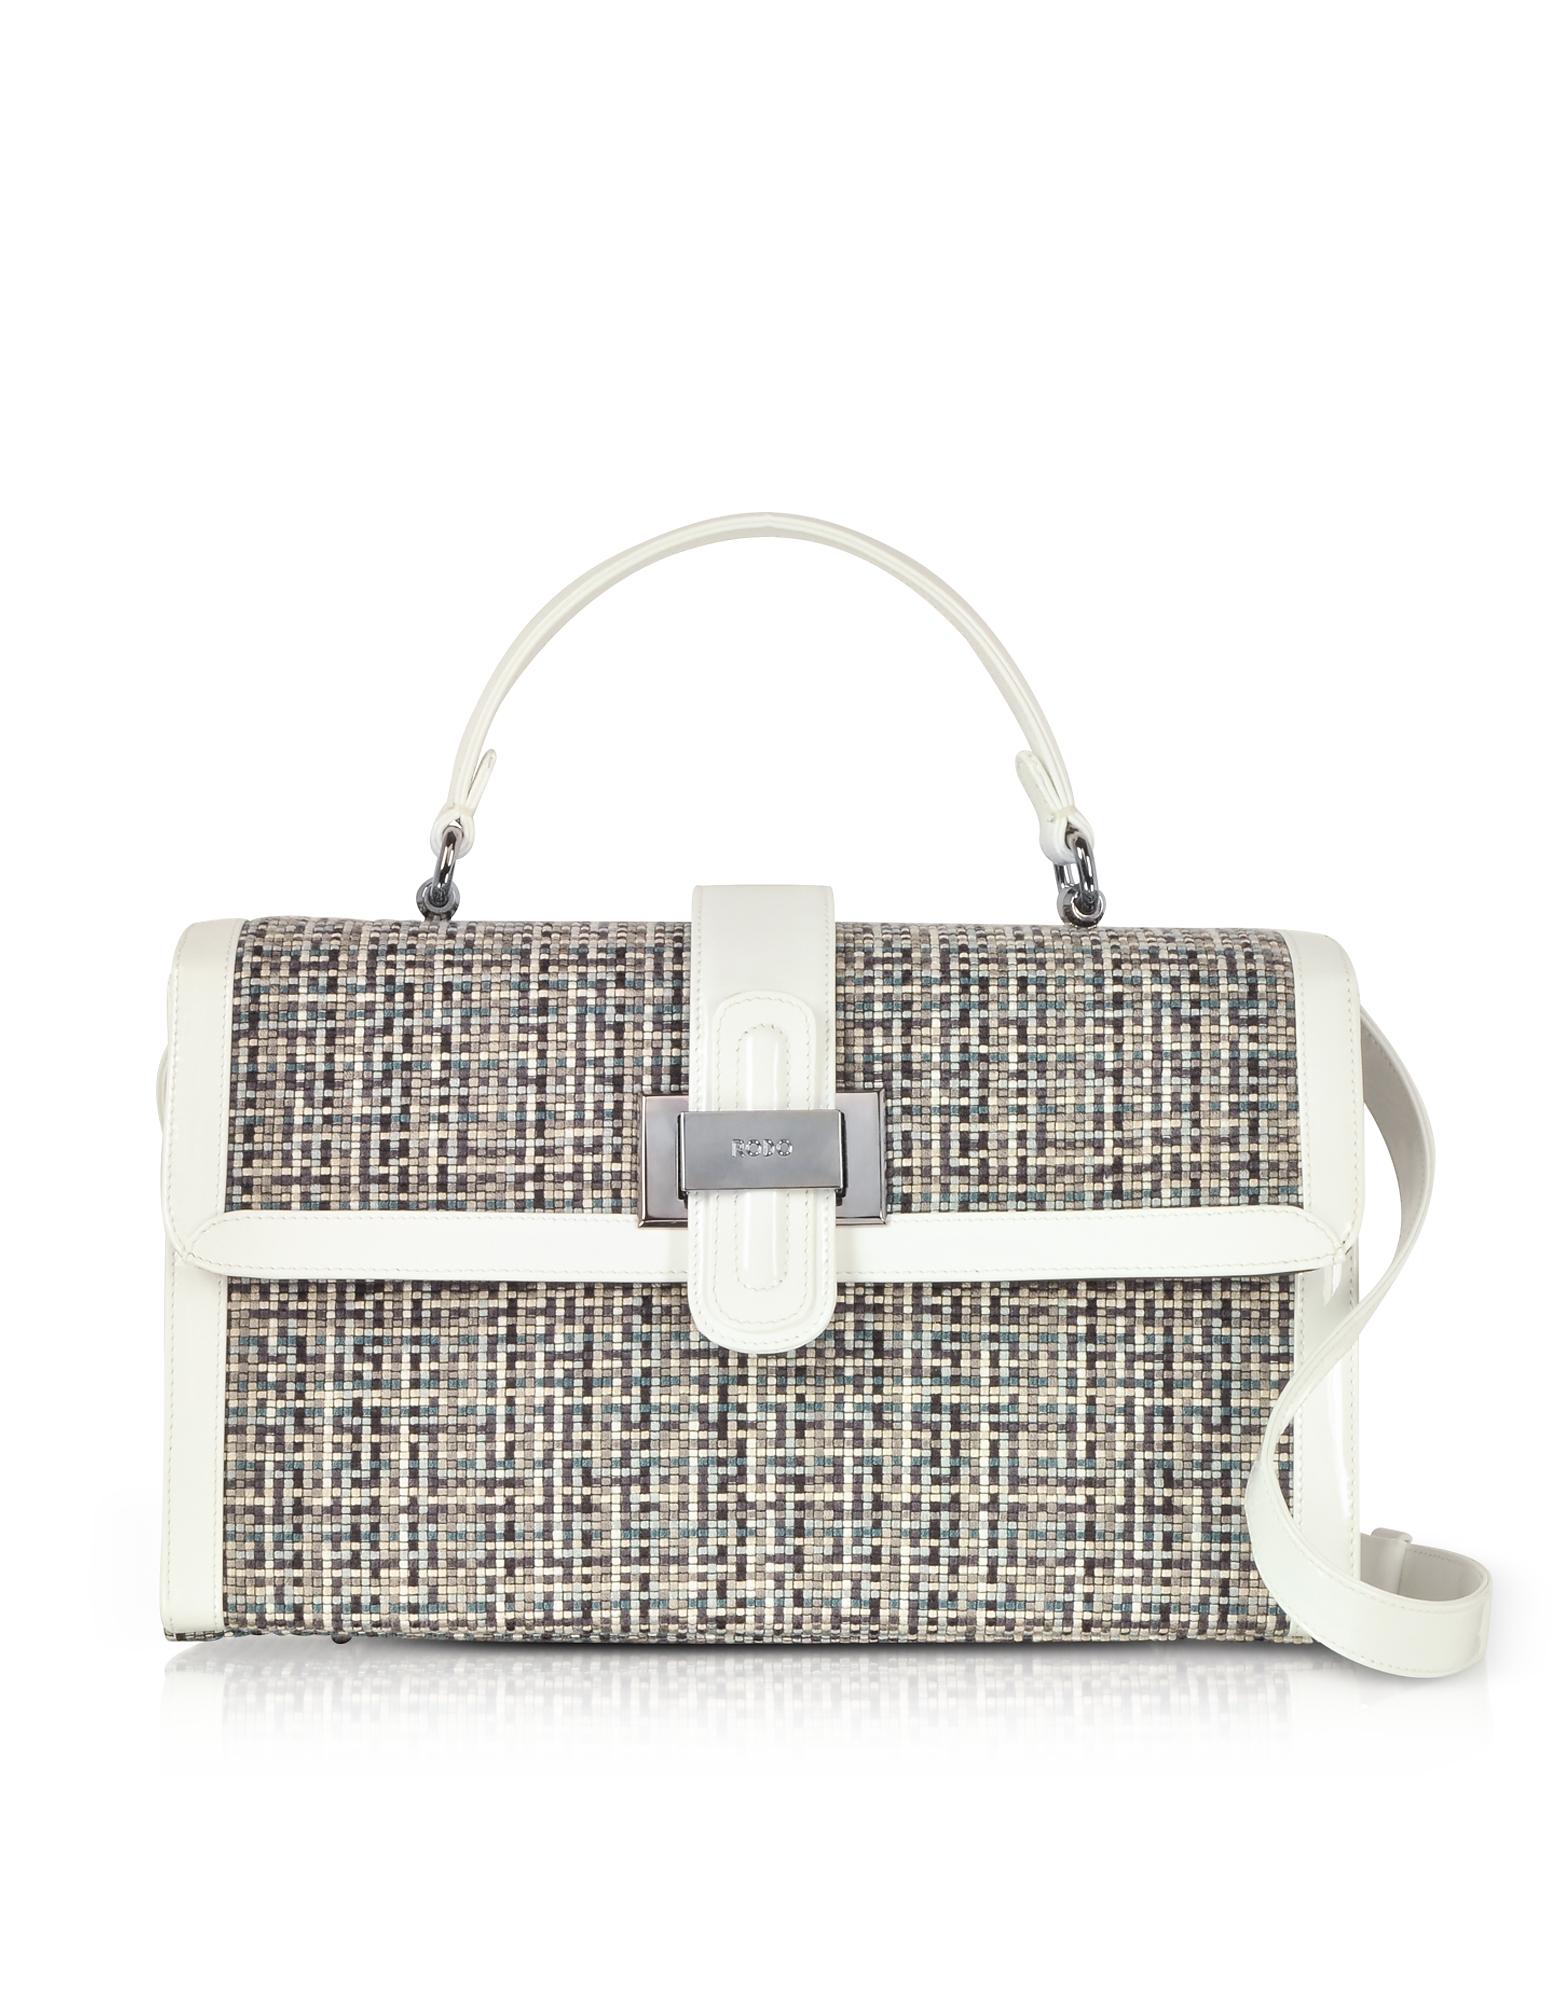 Rodo Handbags, Tweed and Patent leather Top Handle Satchel Bag